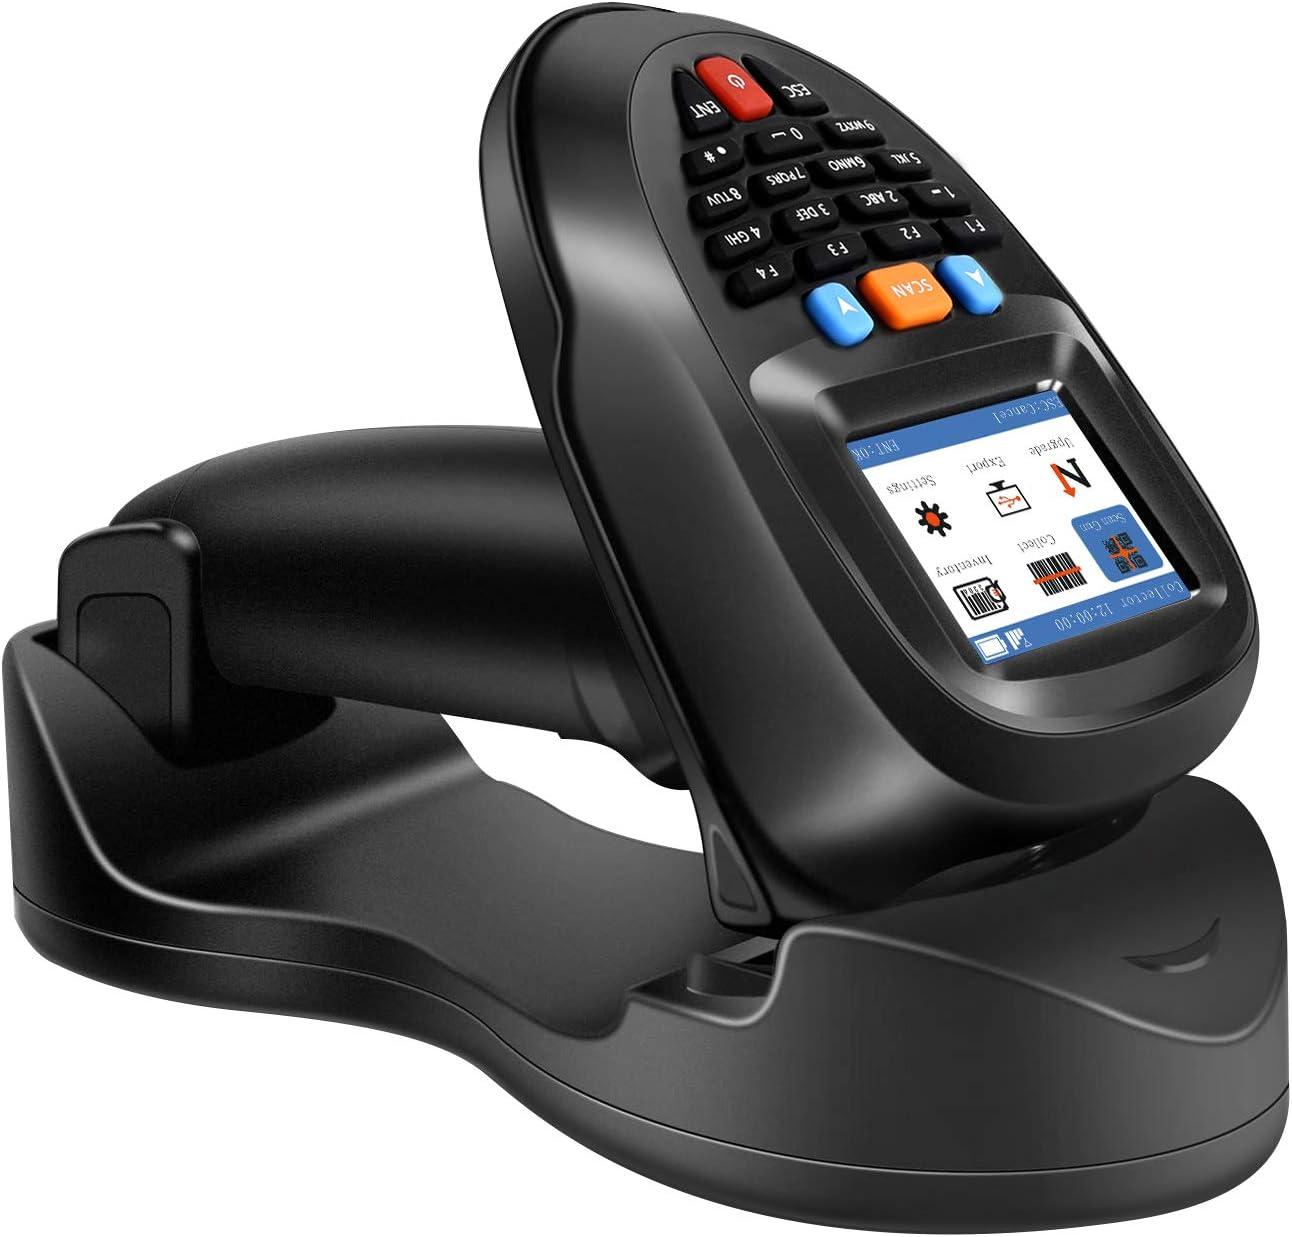 Trohestar N6 Barcode 新作通販 Scanner 訳ありセール 格安 Wireless Handheld Wired PDA Po 1D